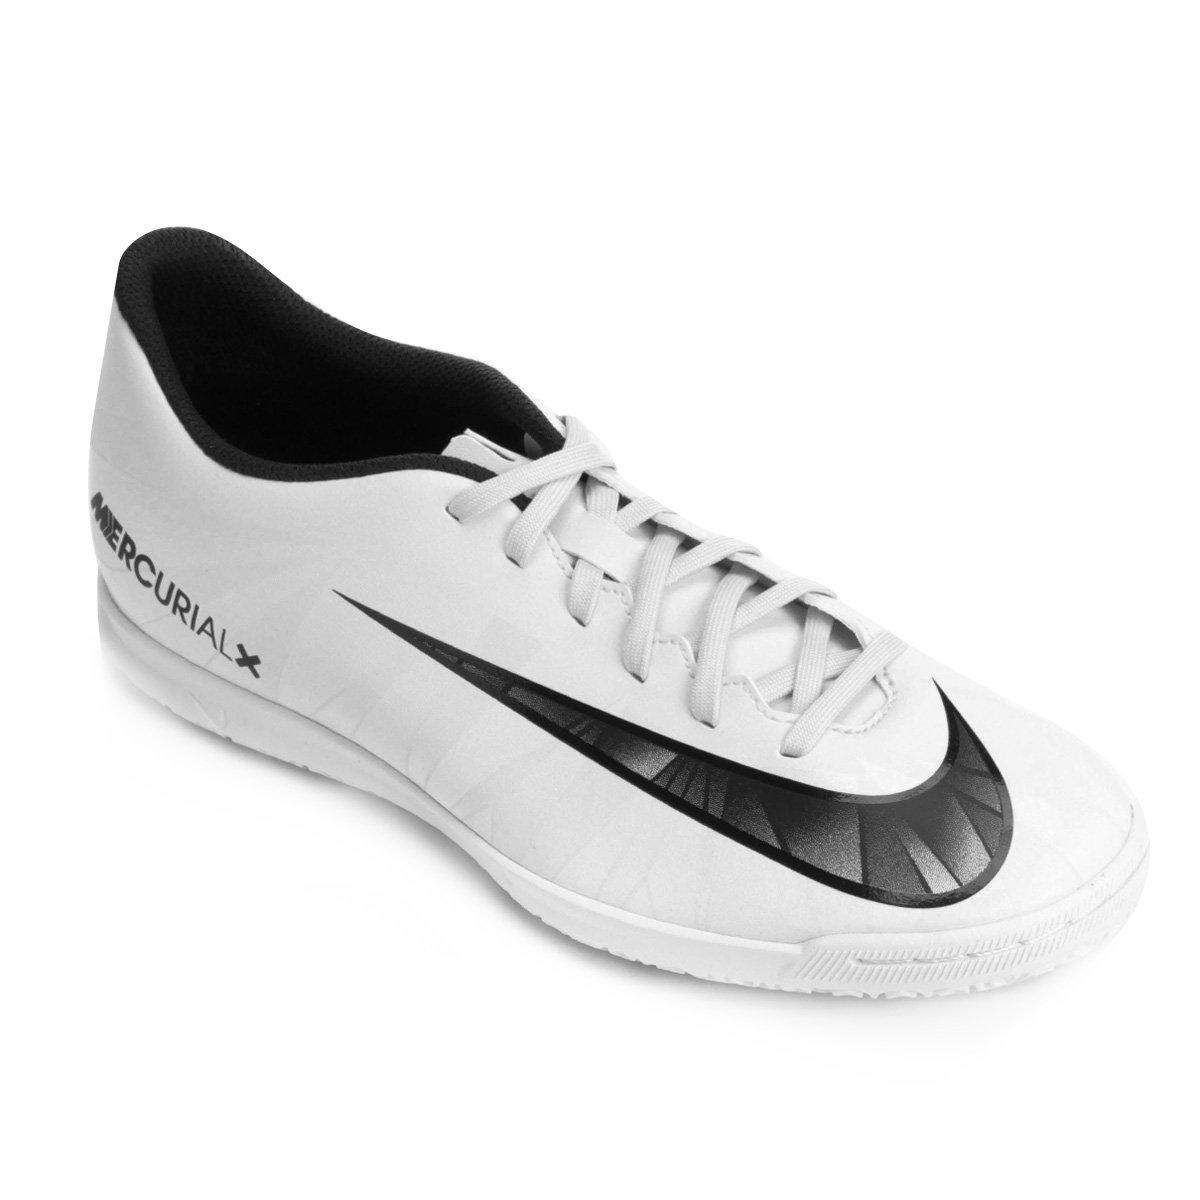 f6cecc3743 Chuteira Futsal Nike Mercurial X Vortex 3 CR7 IC - Compre Agora ...